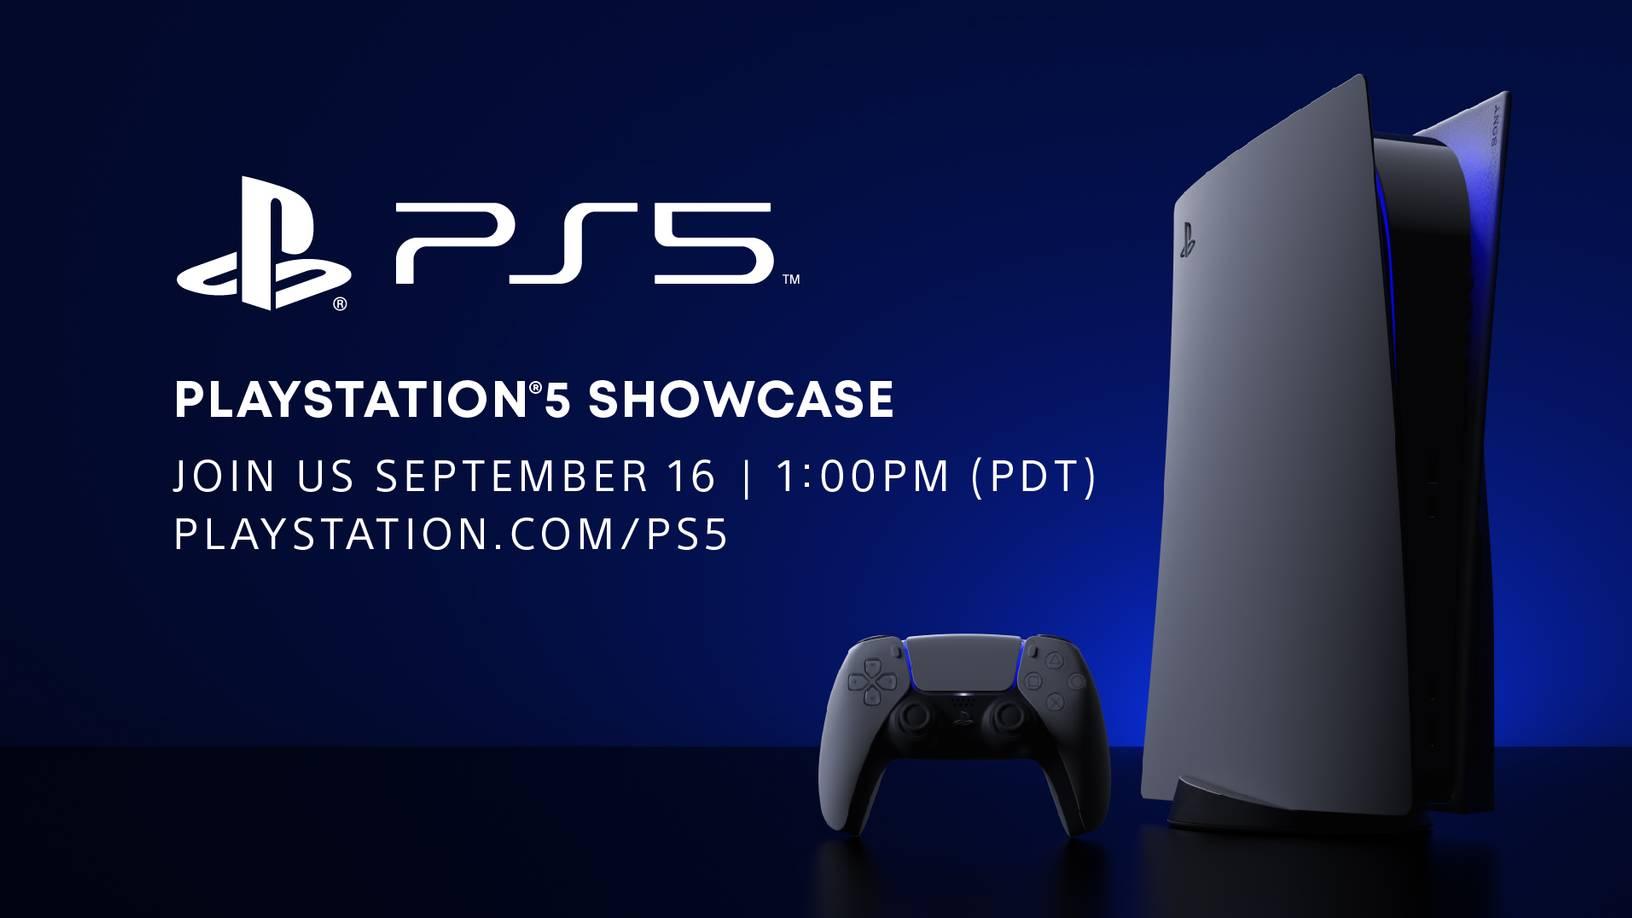 ps5 showcase promo